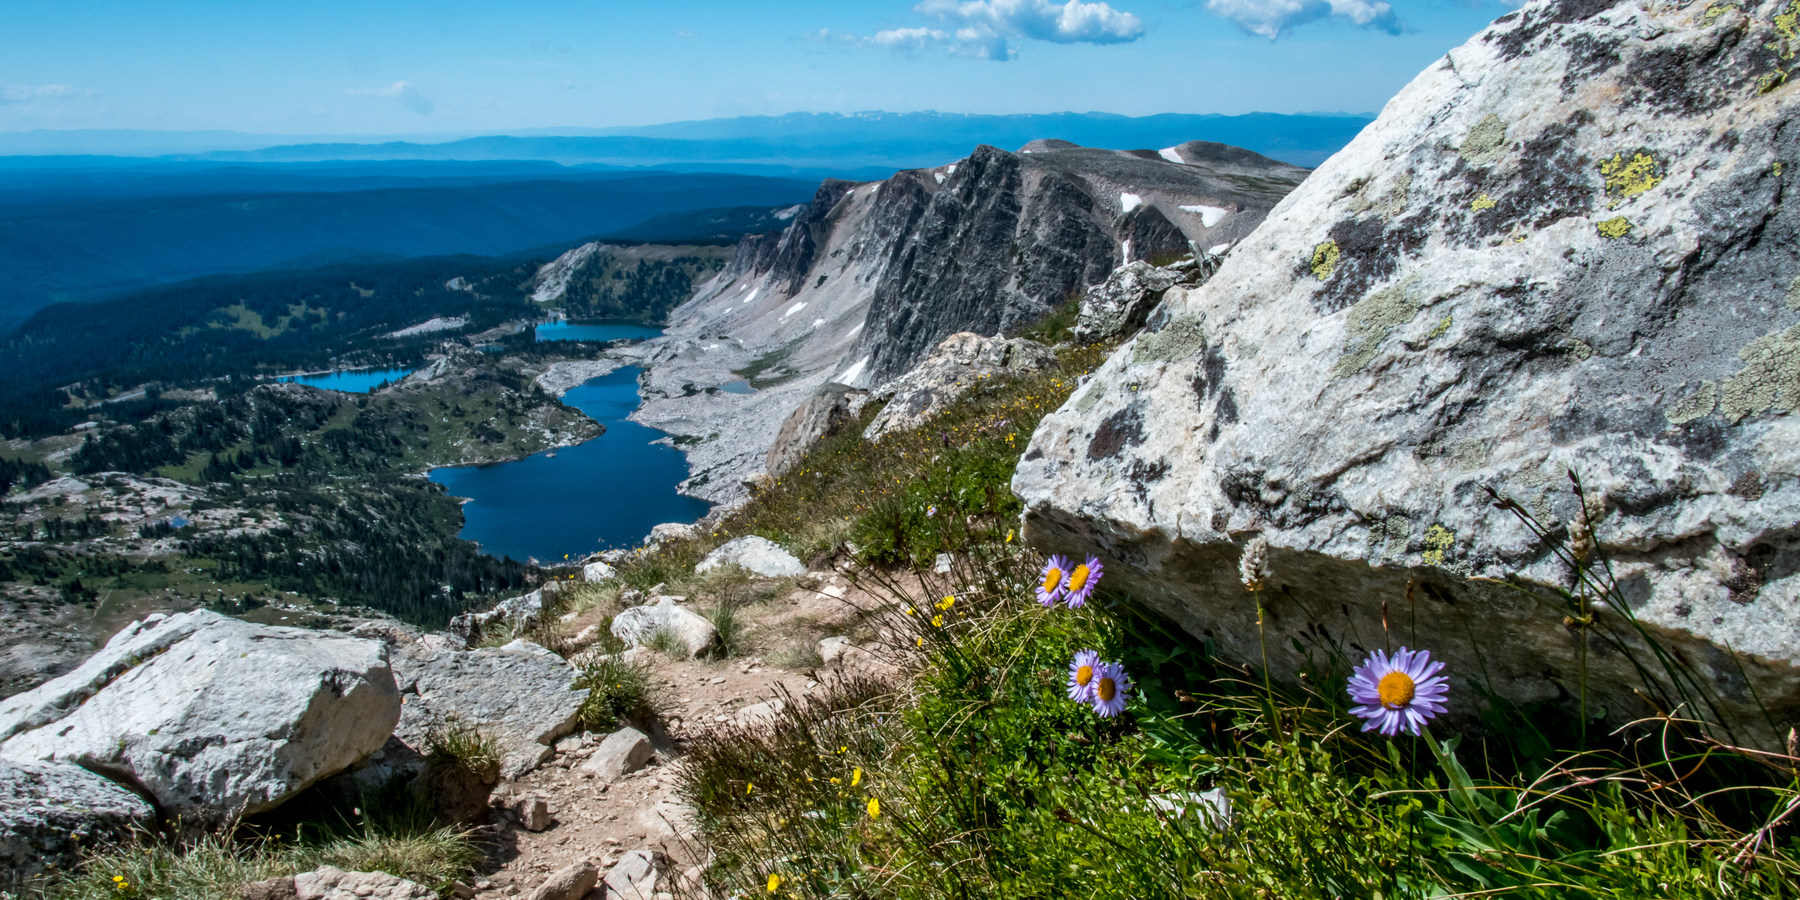 Medicine Bow Peak Trail